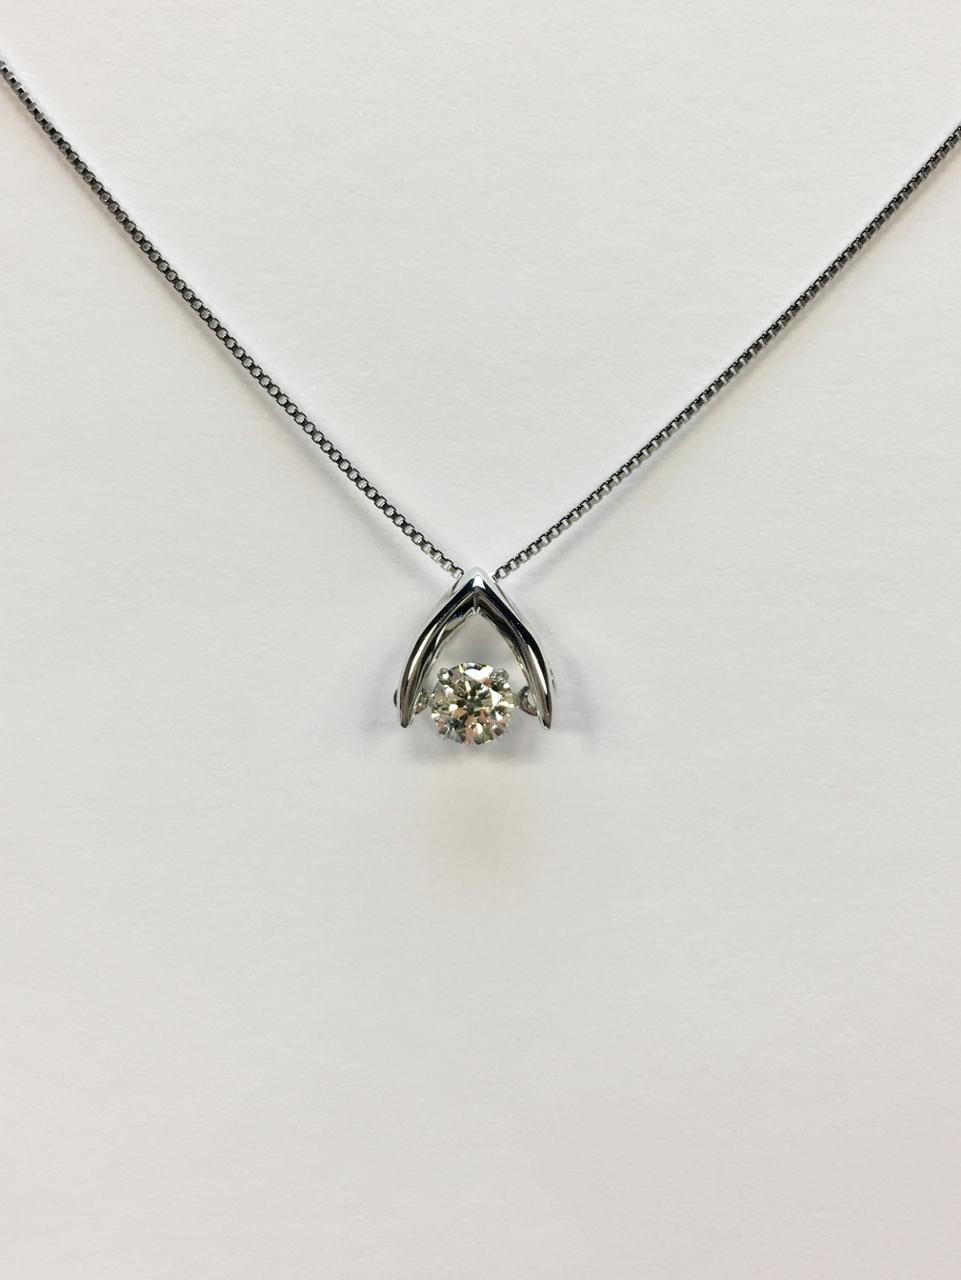 1/5 Carat Platinum Diamond Necklace